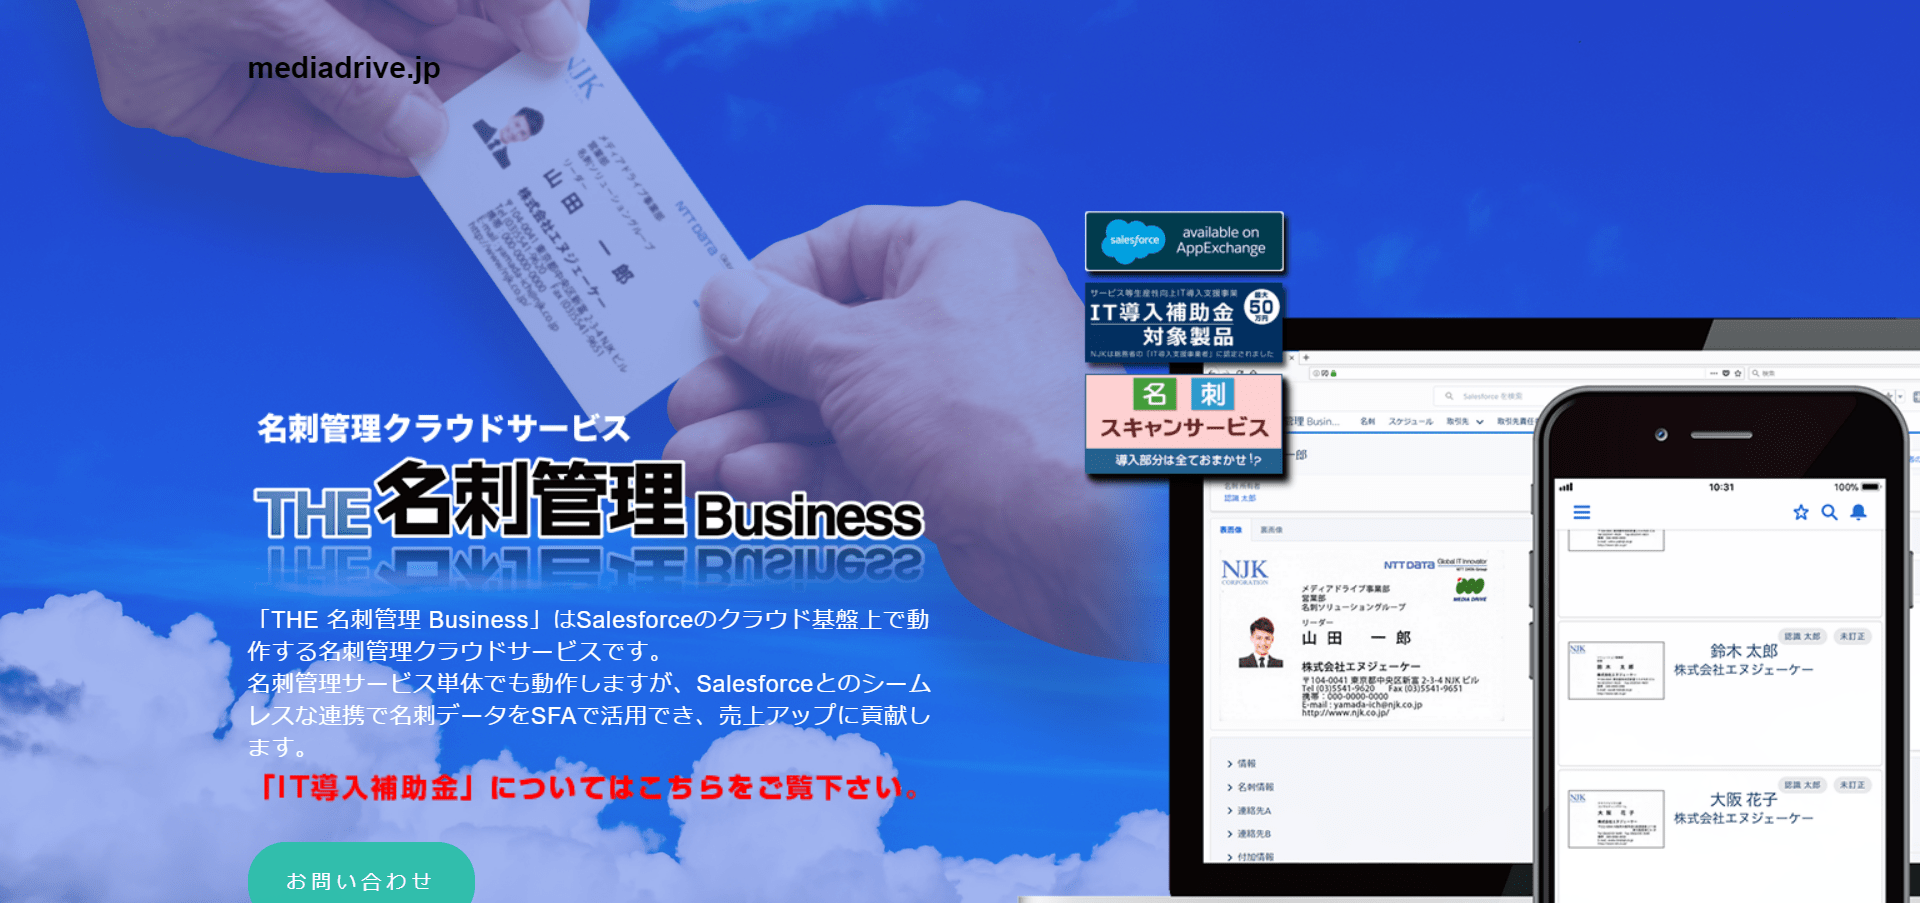 ・AI-OCRの比較4:THE 名刺管理 Business(株式会社NTTデータNJK)